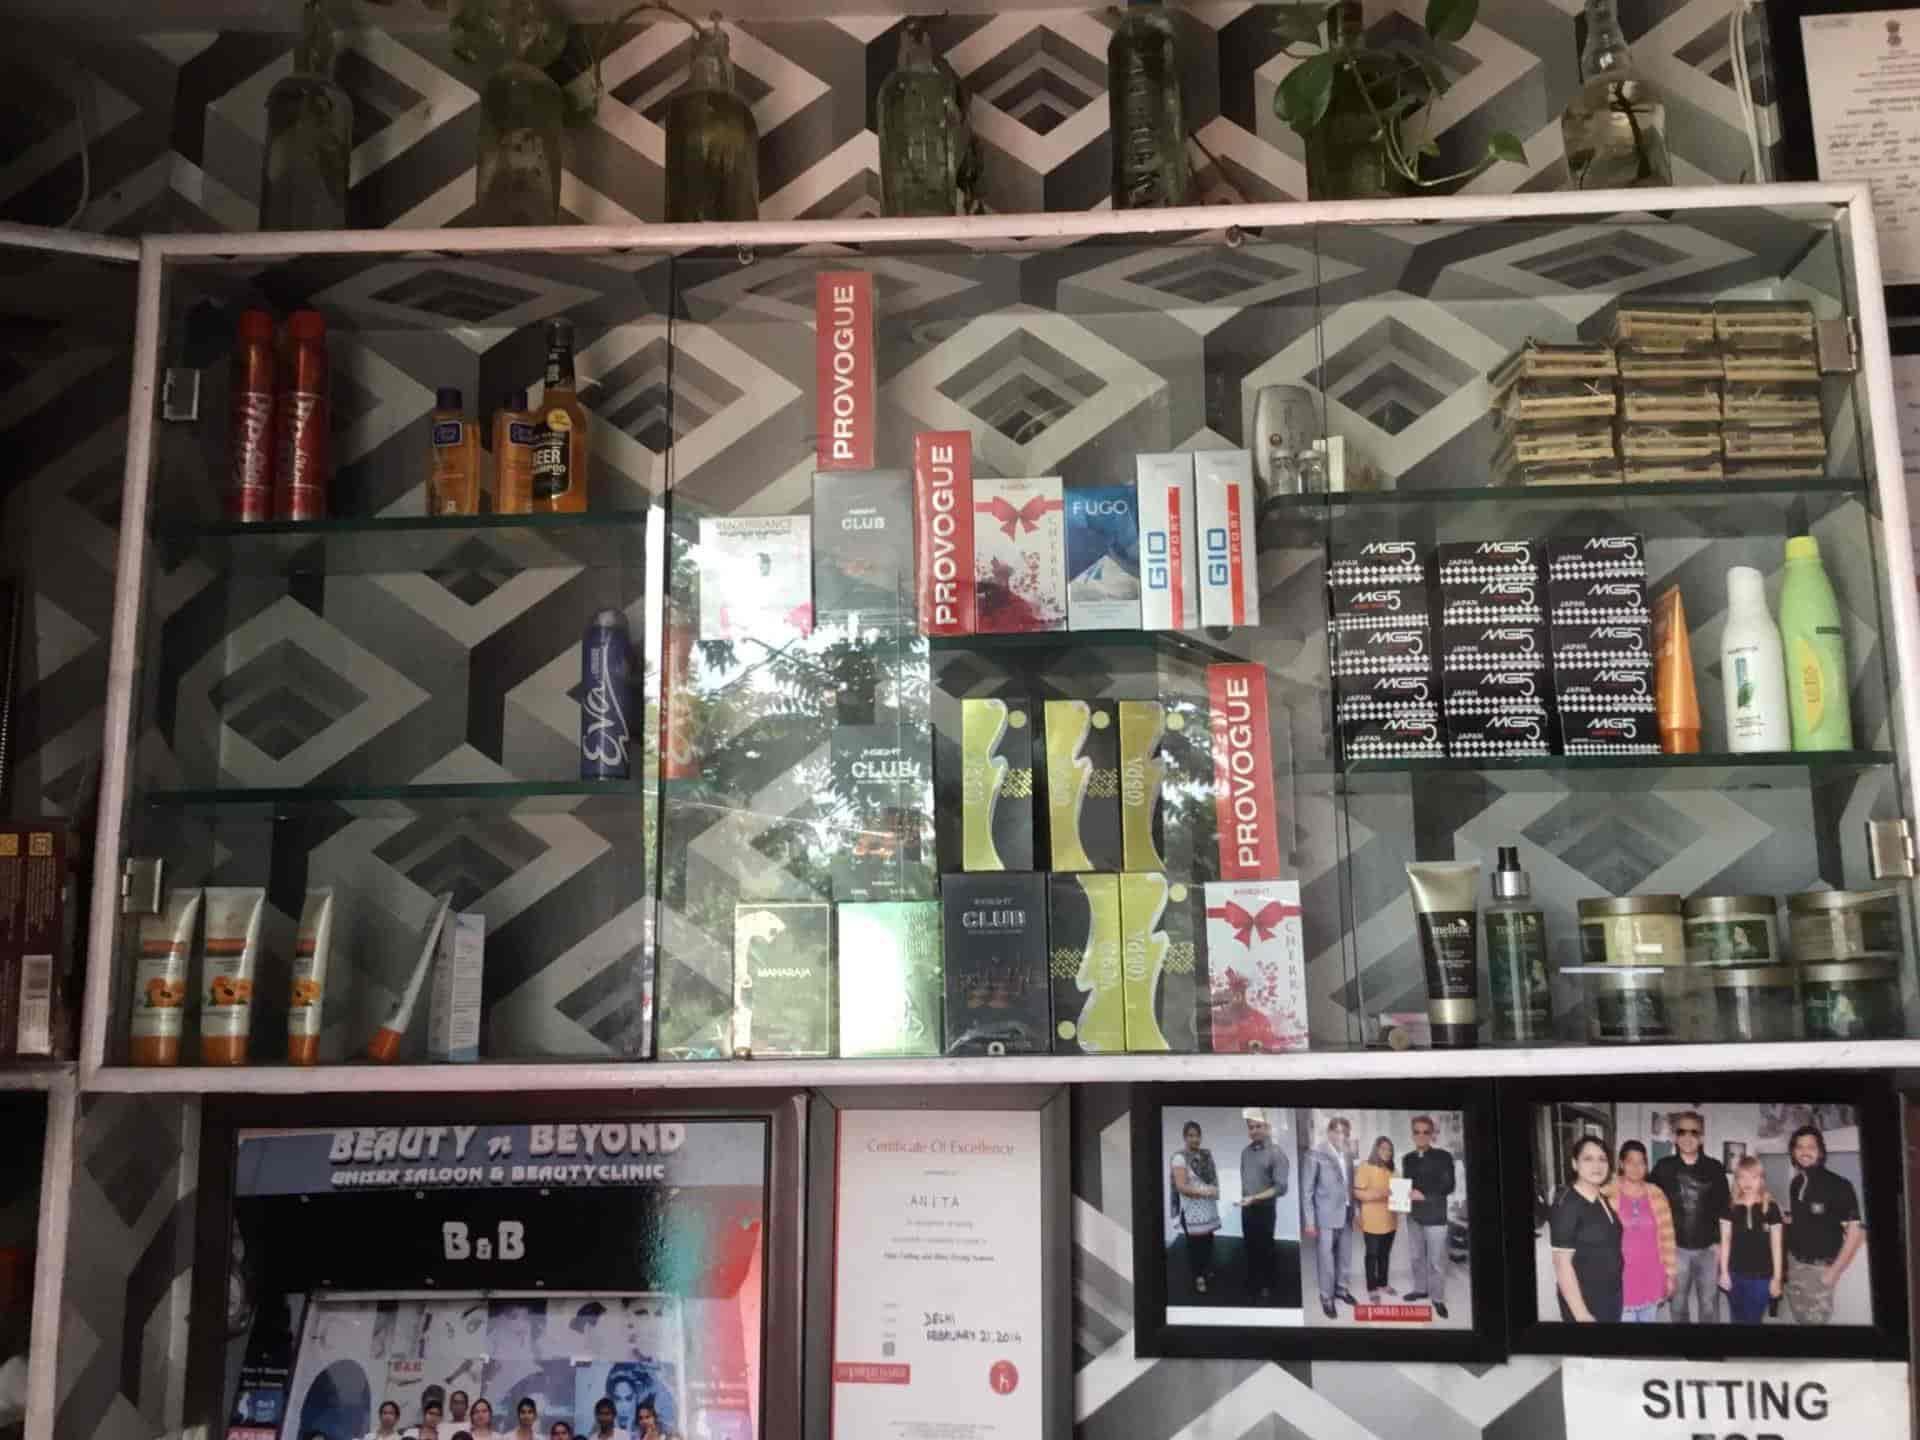 Beauty N Beyond Salon, Model Town - Salons in Rohtak - Justdial